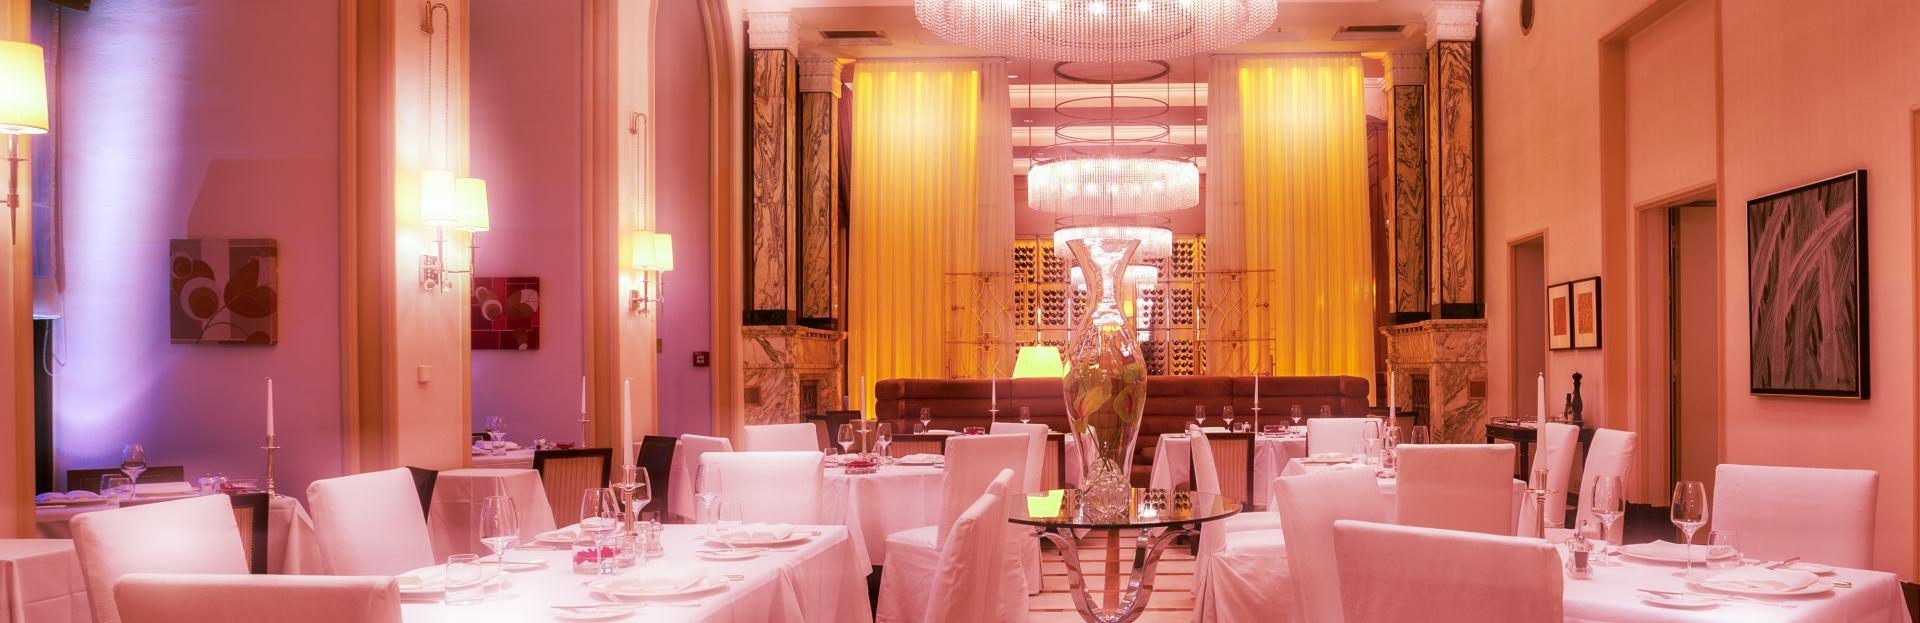 ZINFANDEL'S Pink Gala humanitarna večera uz nastup 'The Frajli'